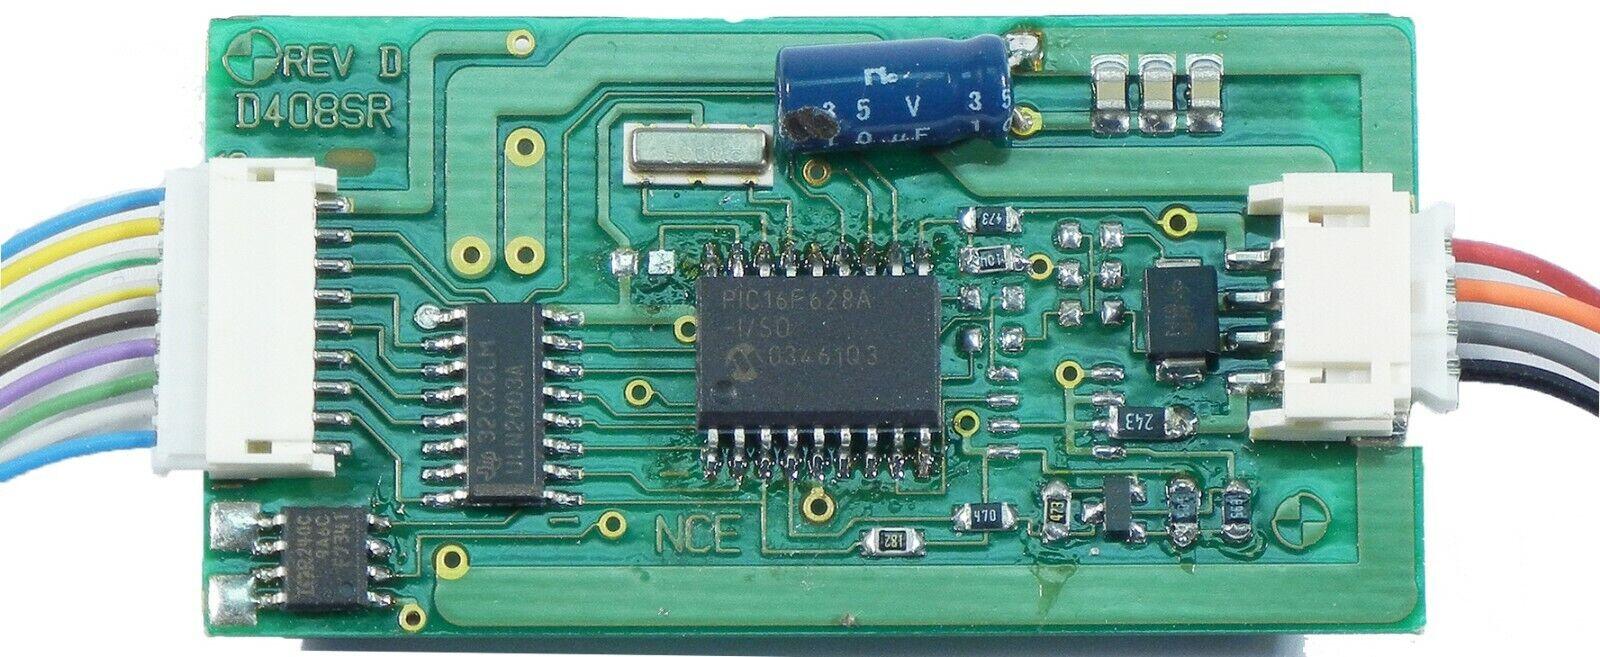 NCE  nuevo 2019  D408 decodificador DCC 4 Amp, 9 funciones  S, O, G, LGB, gran escala